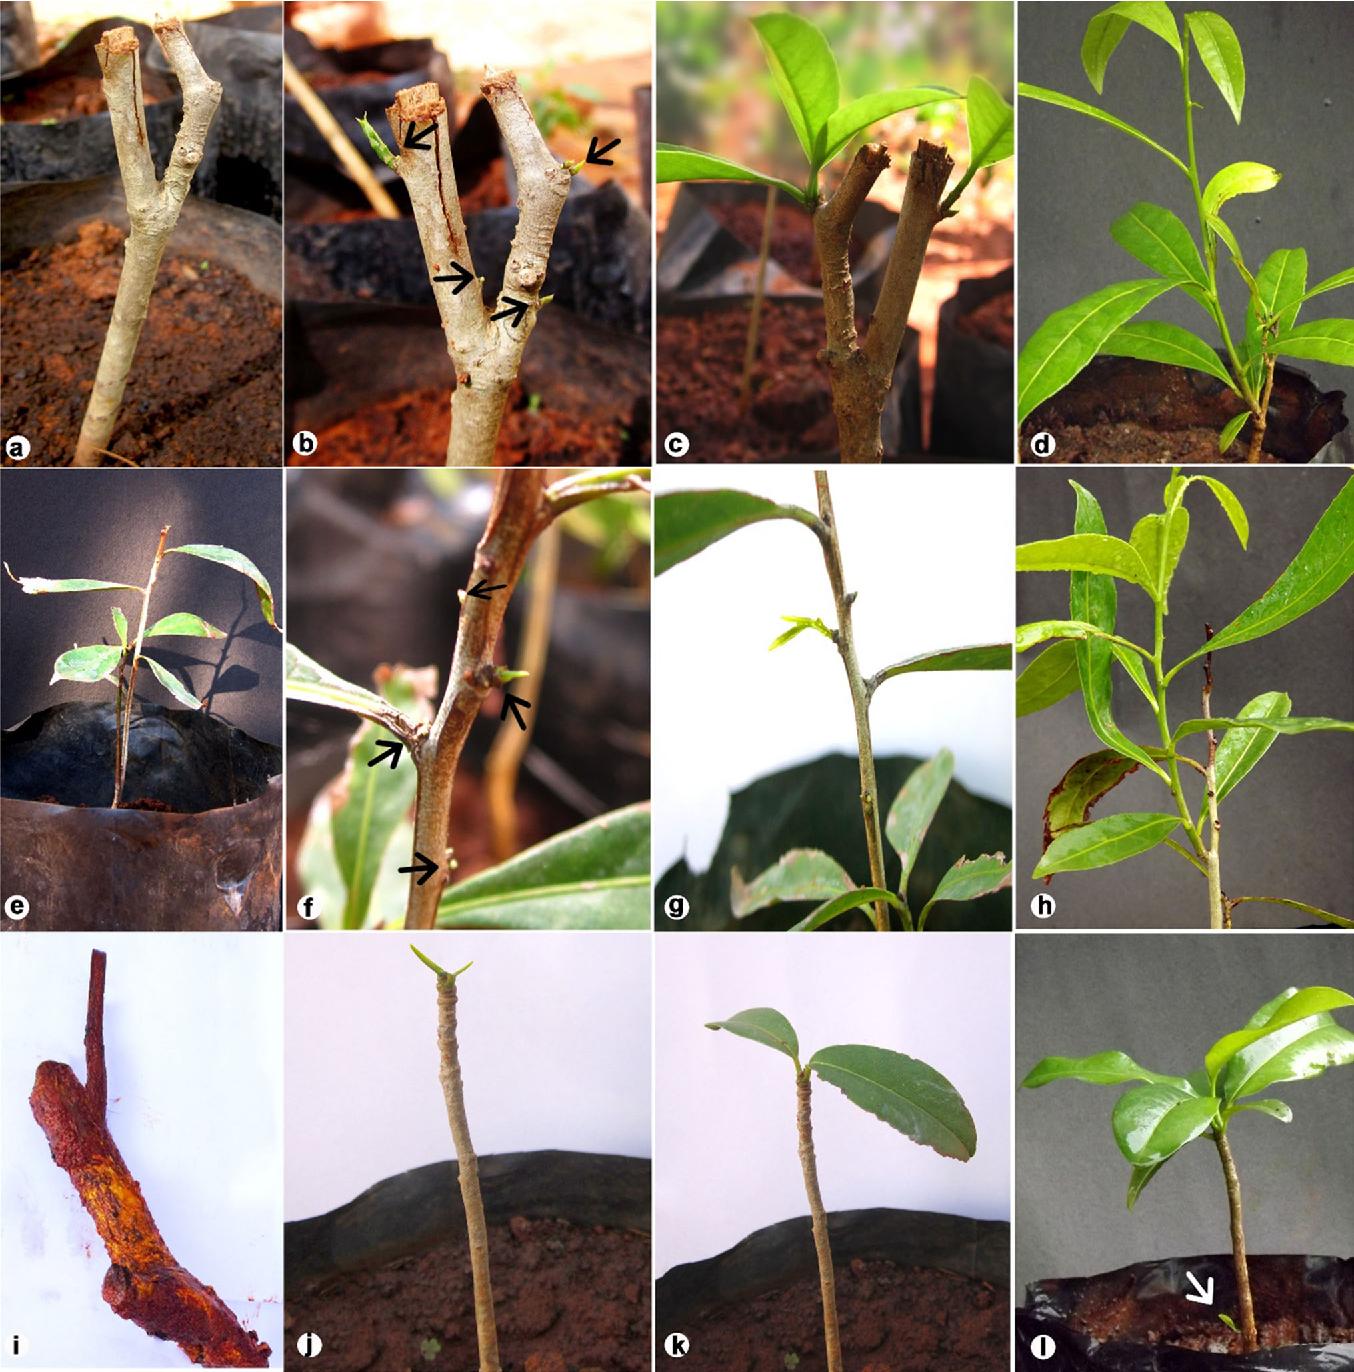 A Simple And Effective Method For Vegetative Propagation Of An Endangered Medicinal Plant Salacia Oblonga Wall Semantic Scholar